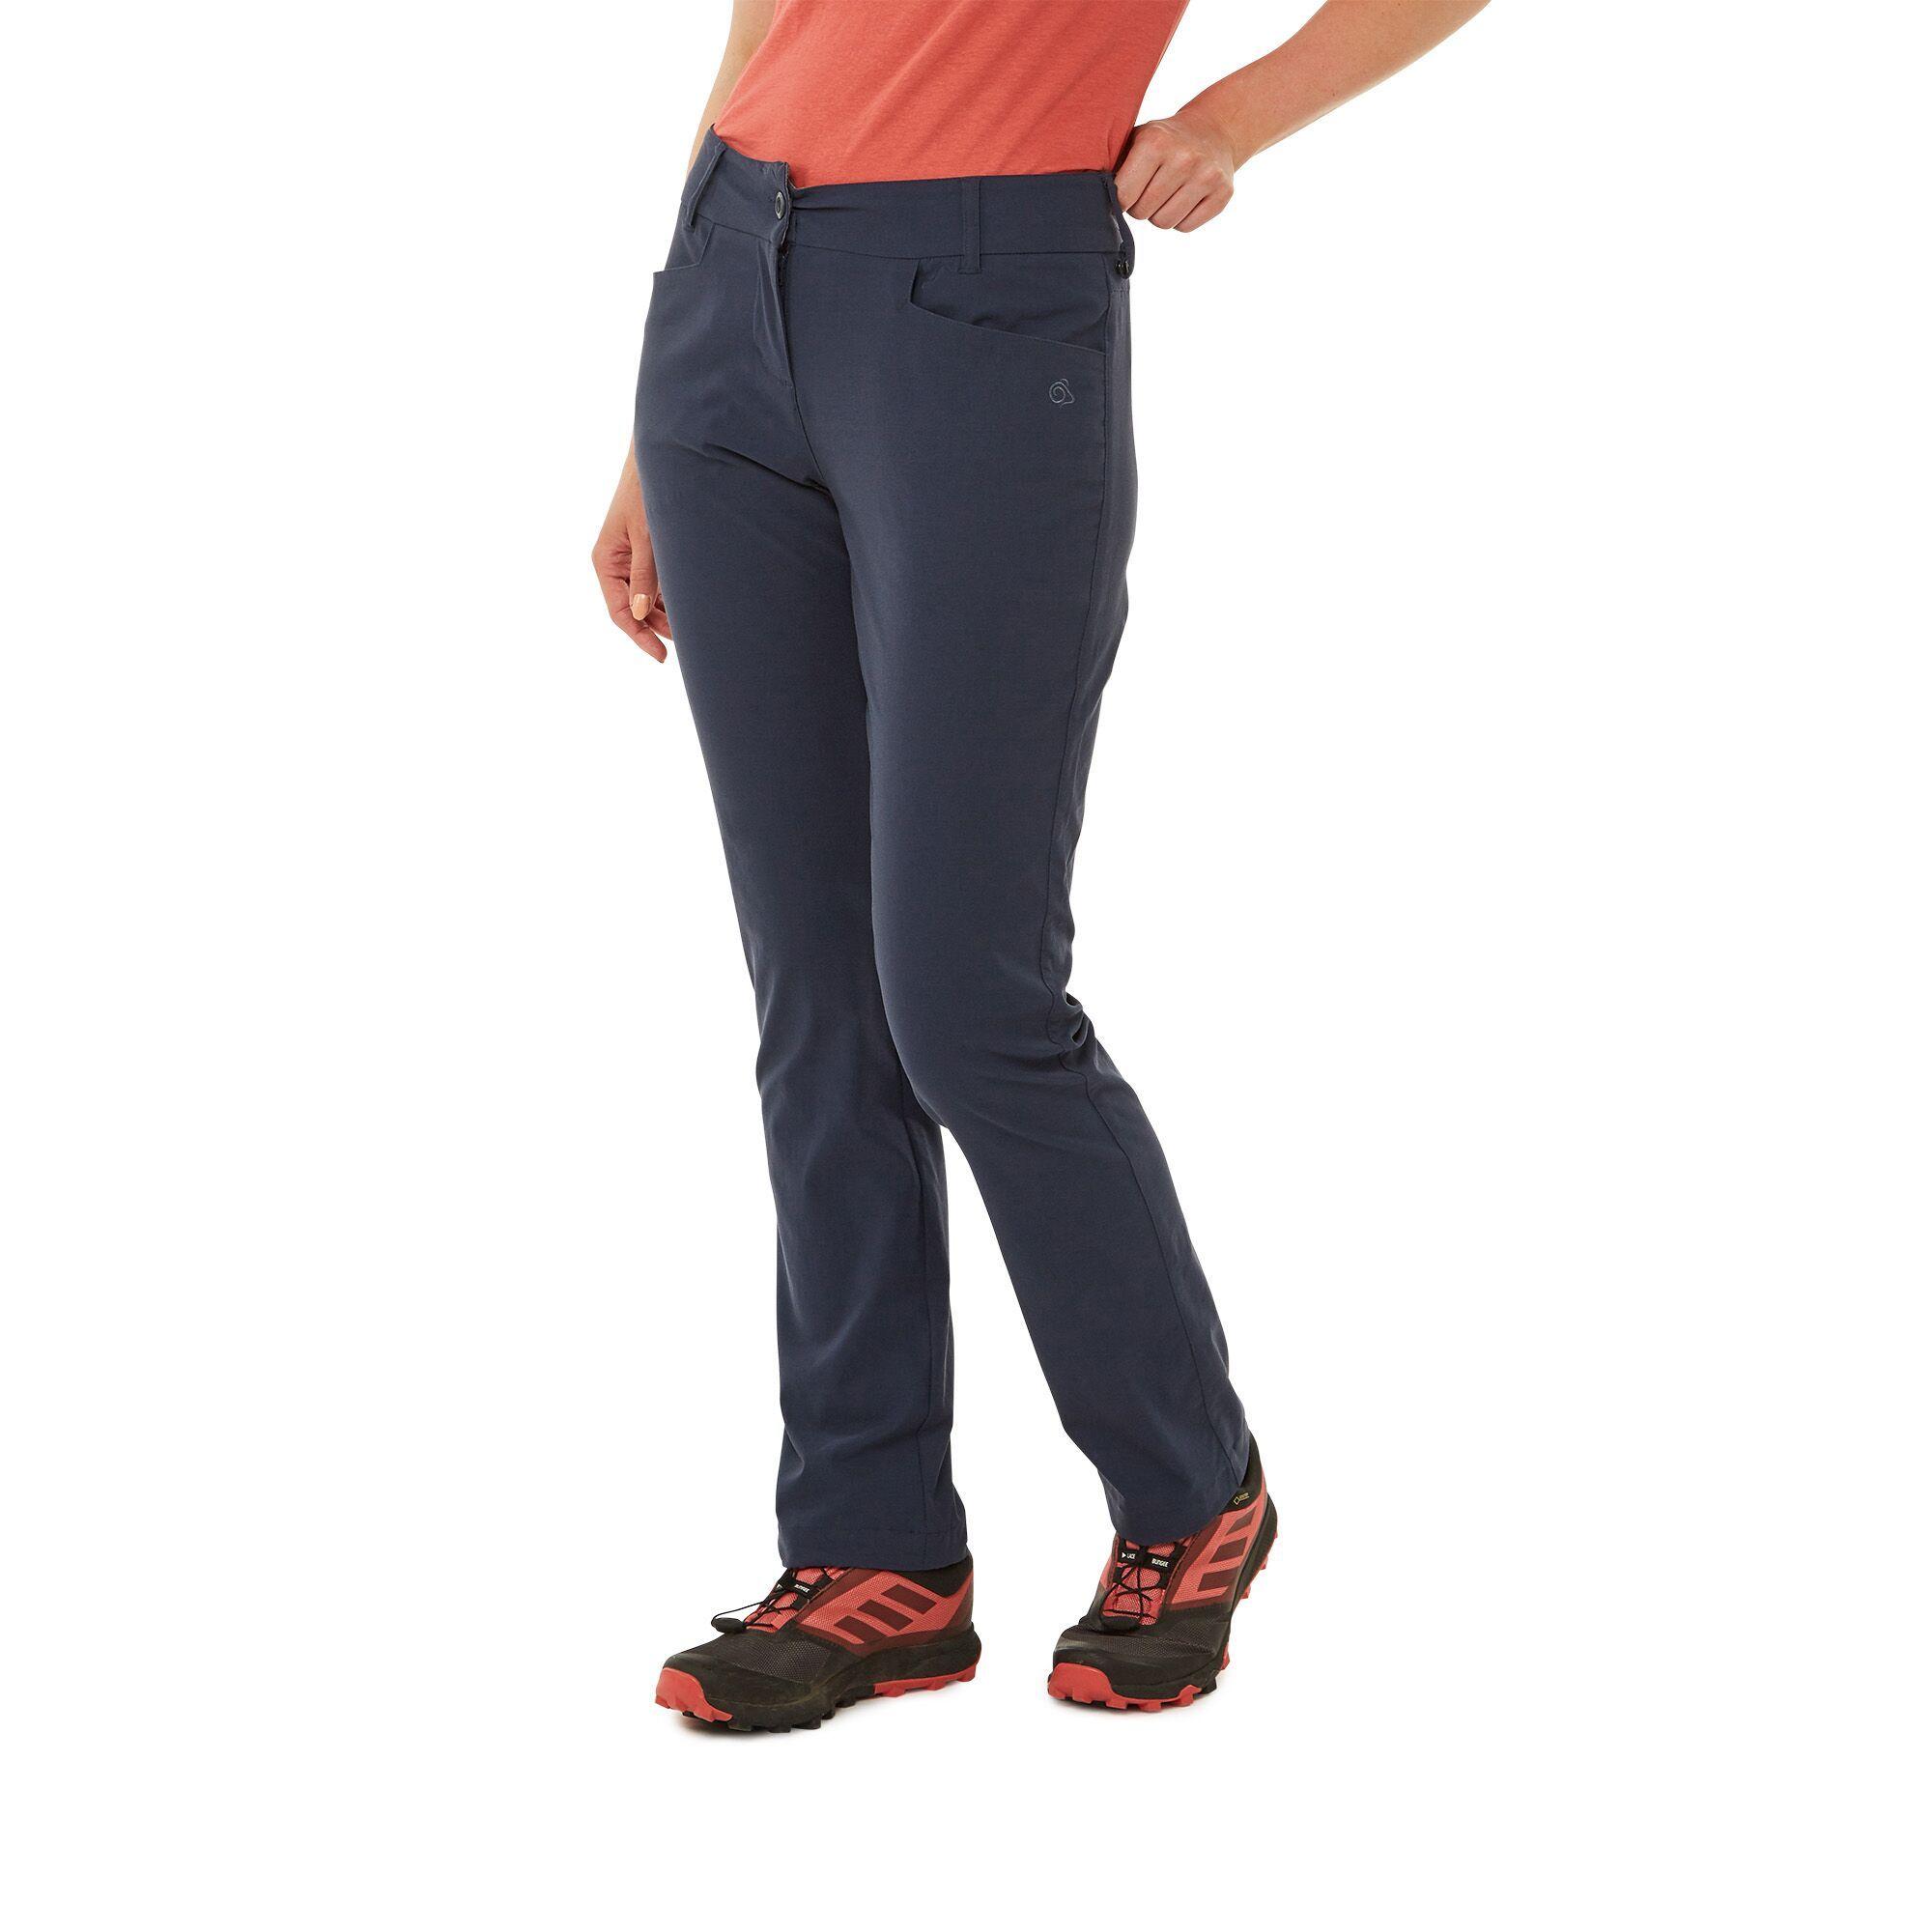 Craghoppers-Pantalon-CLARA-Femme-CG1066 miniature 4